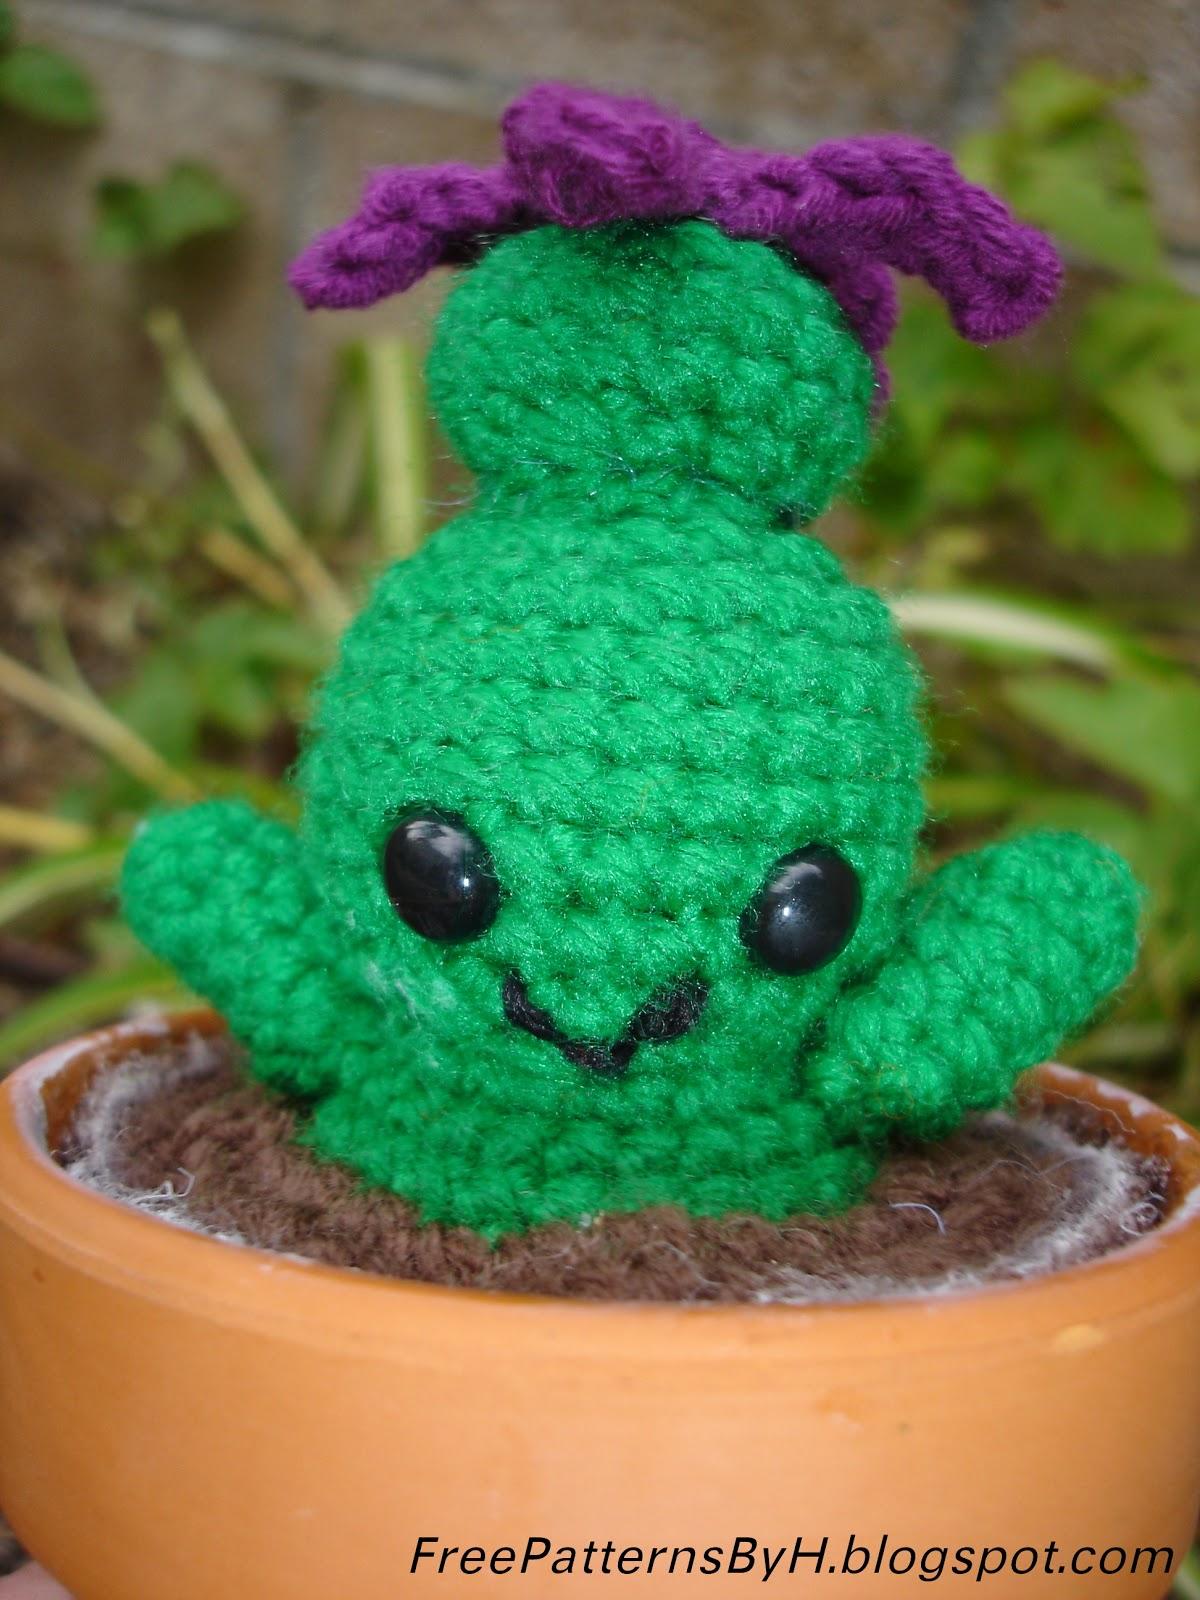 Free Patterns by H: Masaka, the Amigurumi Cactus